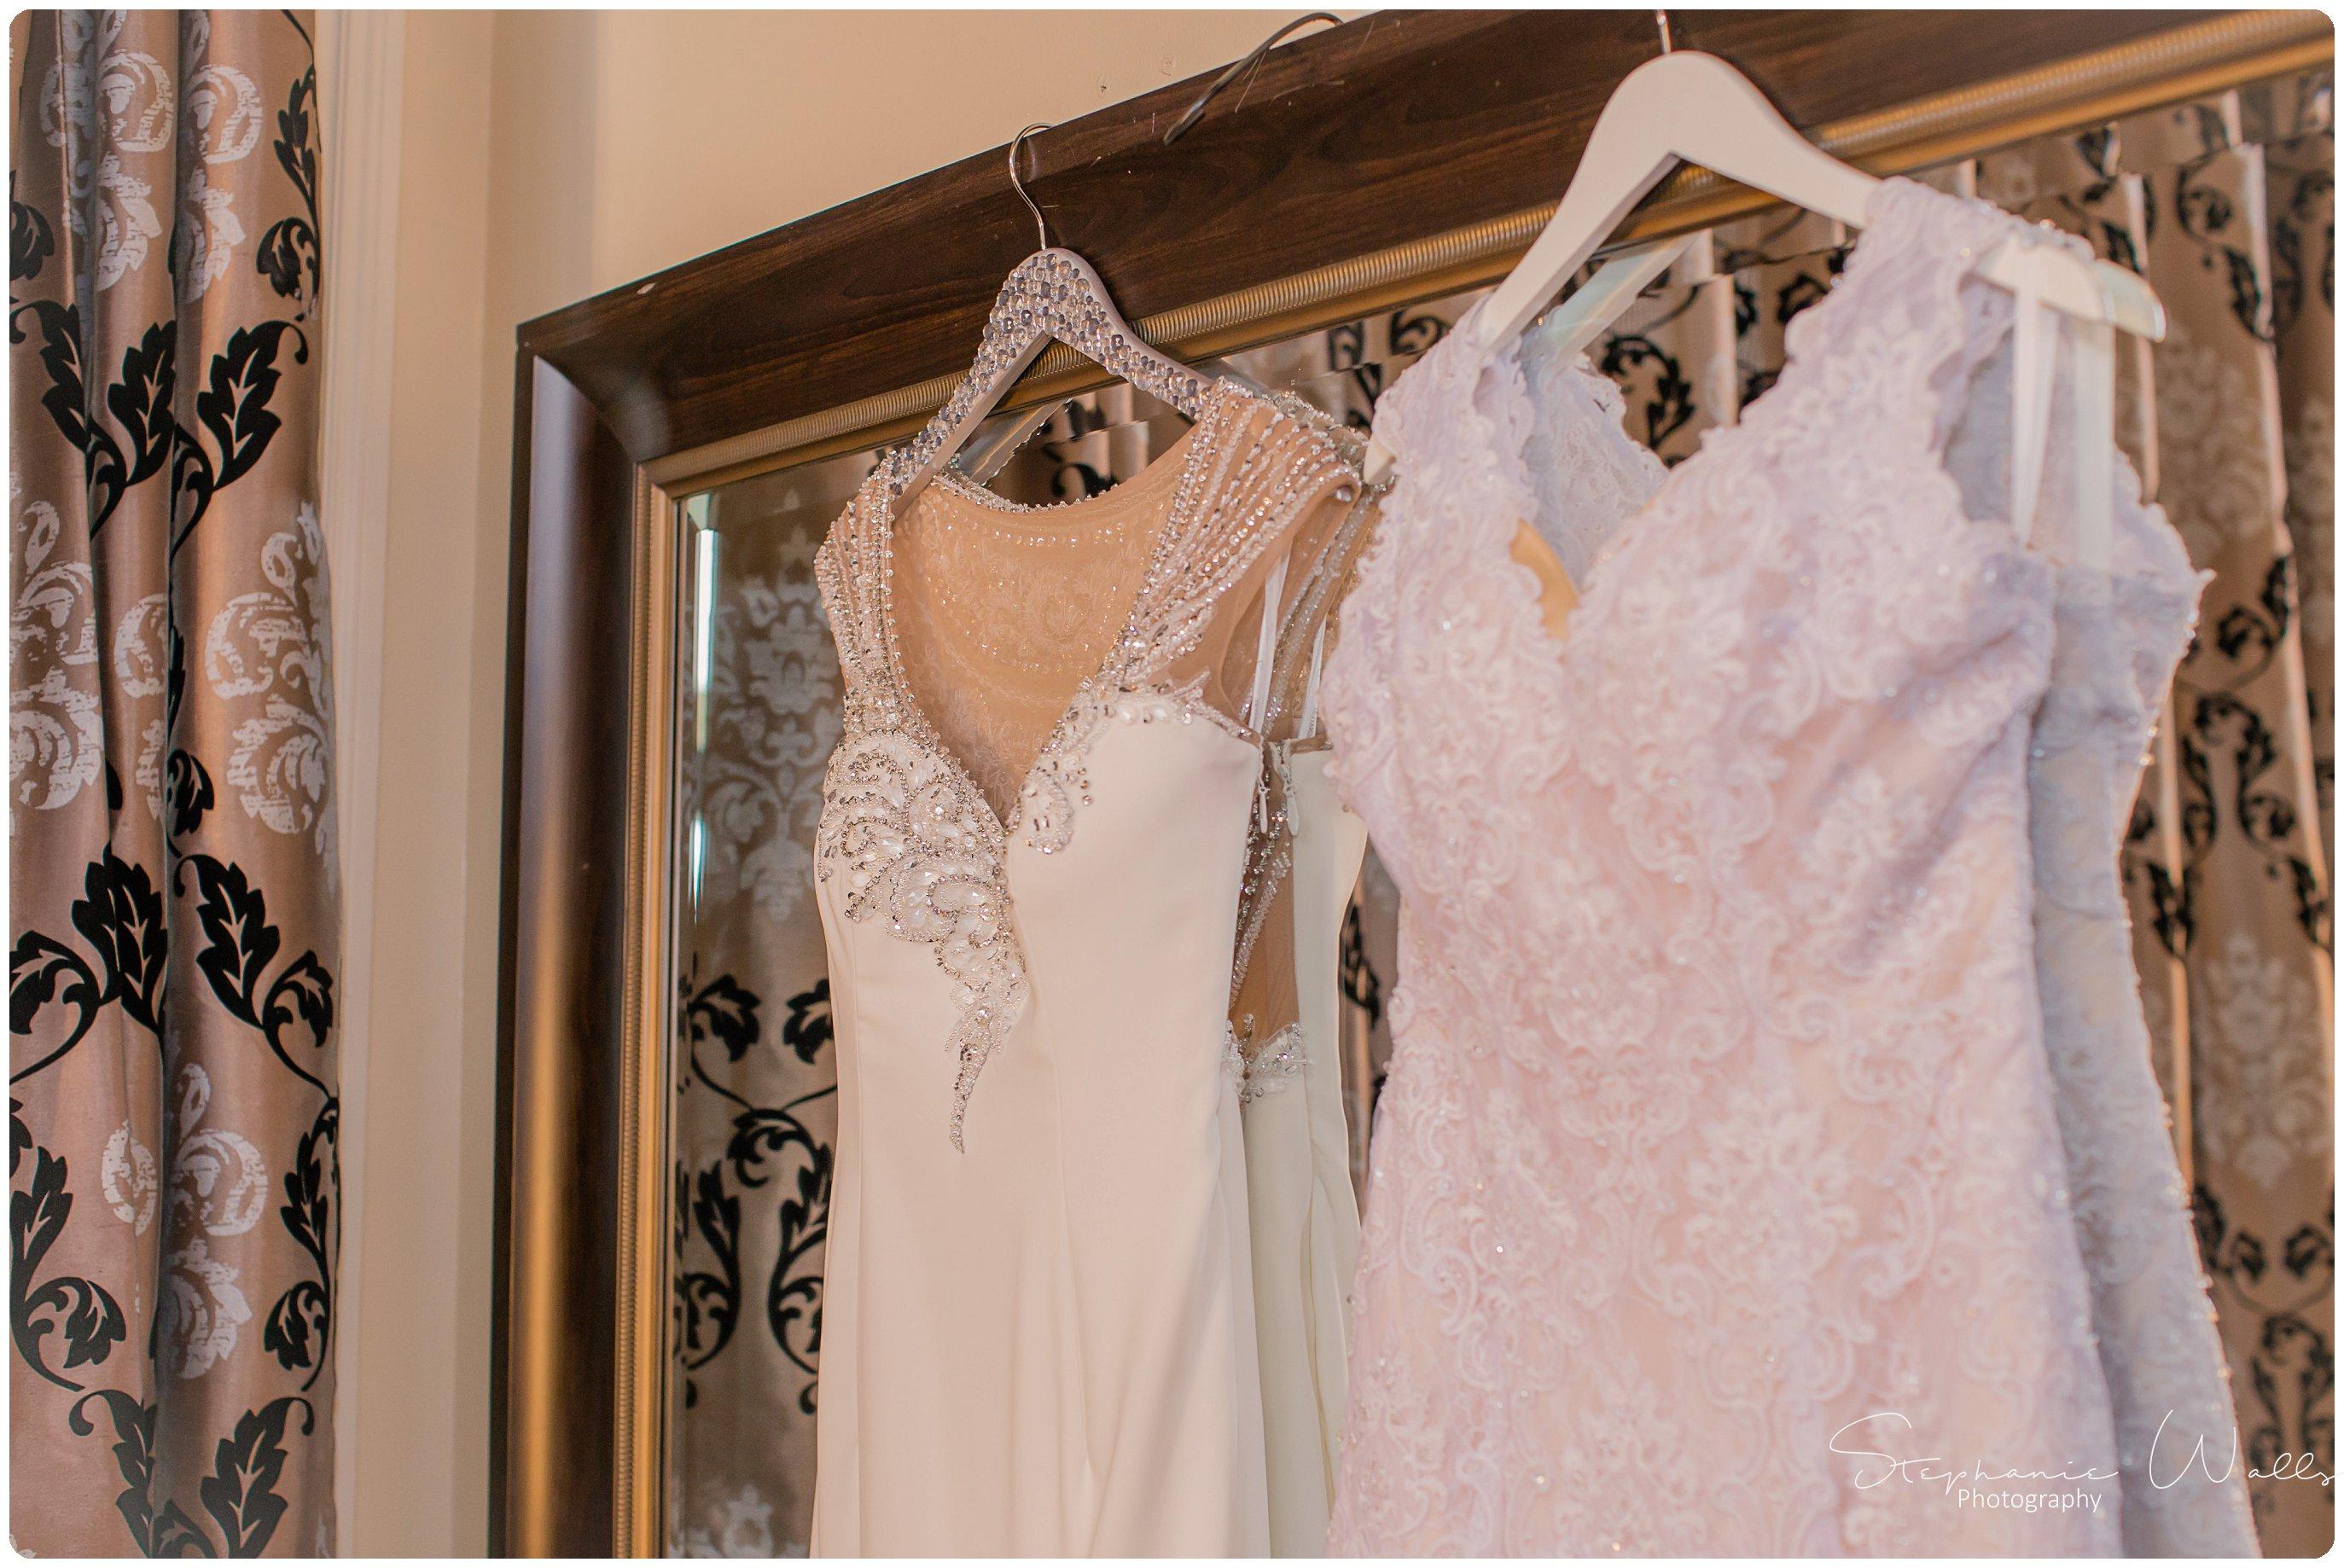 Sears Details 004 The Hero & The Starlet | Monte Cristo Ballroom | Stephanie Walls Photography Weddings